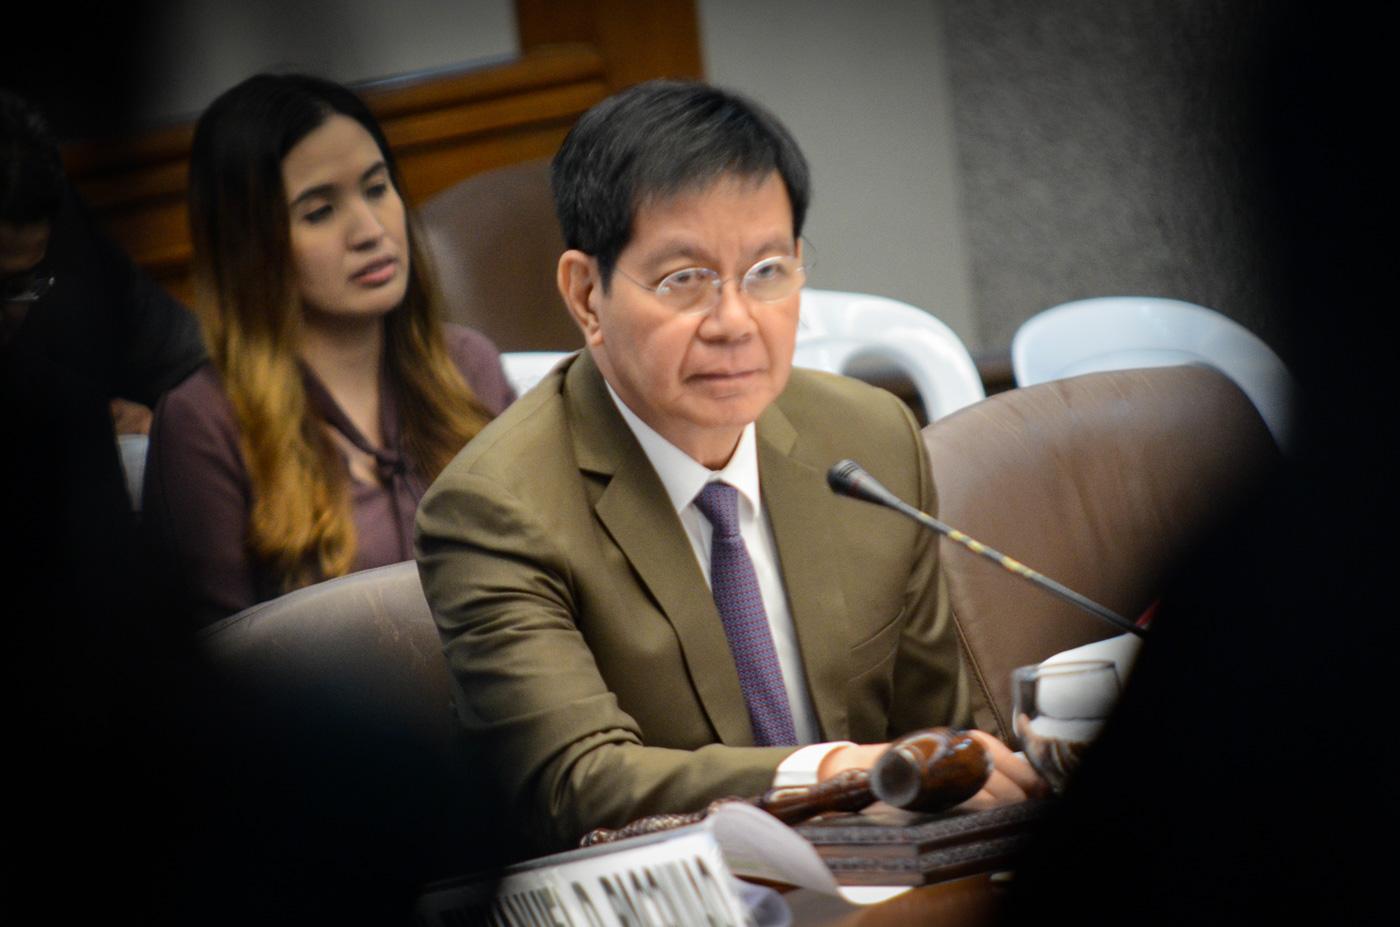 TRAUMATIZED. Senator Panfilo Lacson at the Lascau00f1as hearing on March 6, 2017.